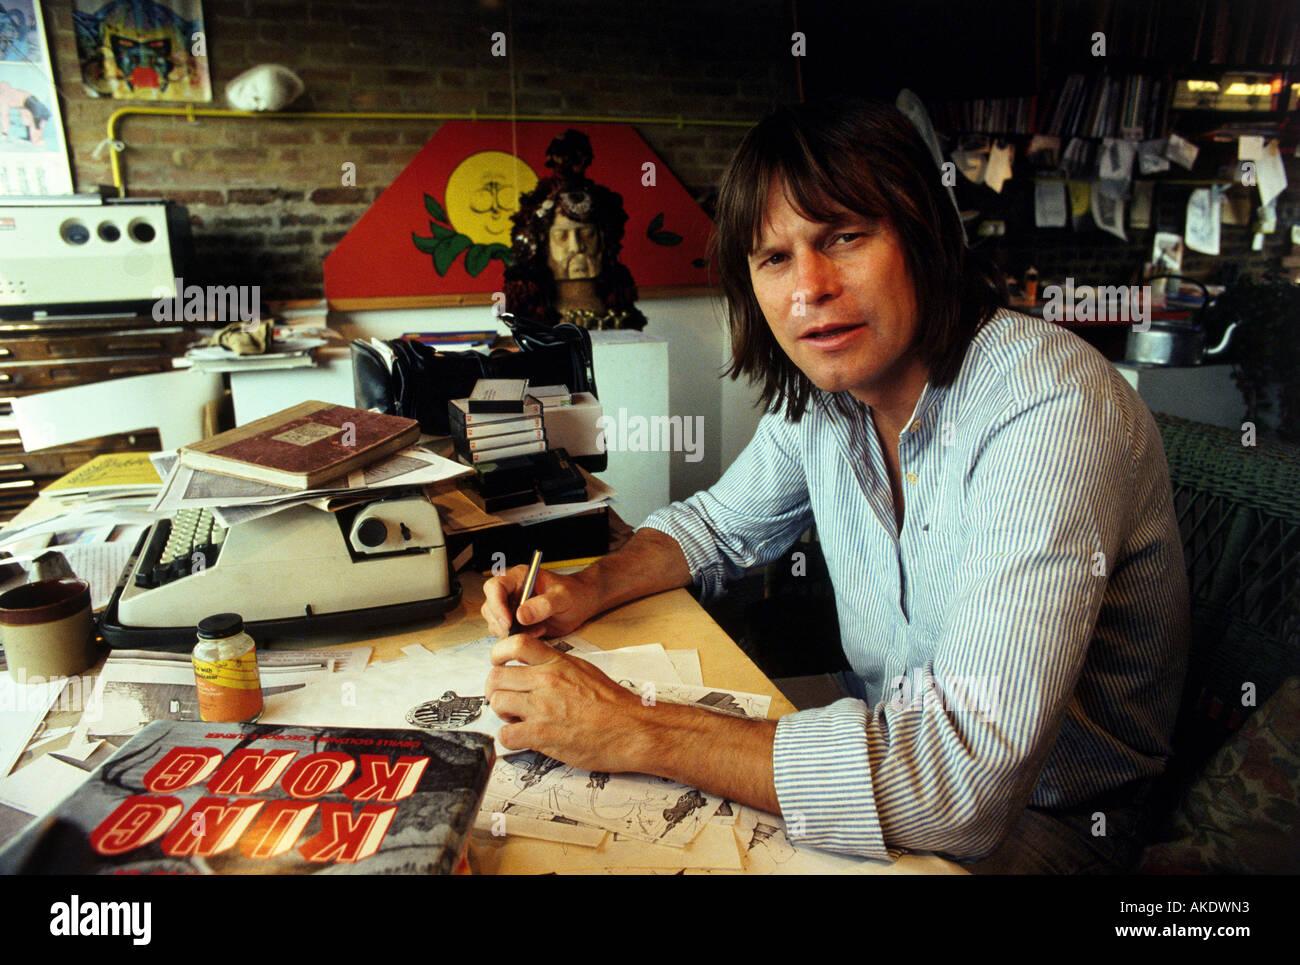 TERRY GILLIAM US film director writer and animator - Stock Image